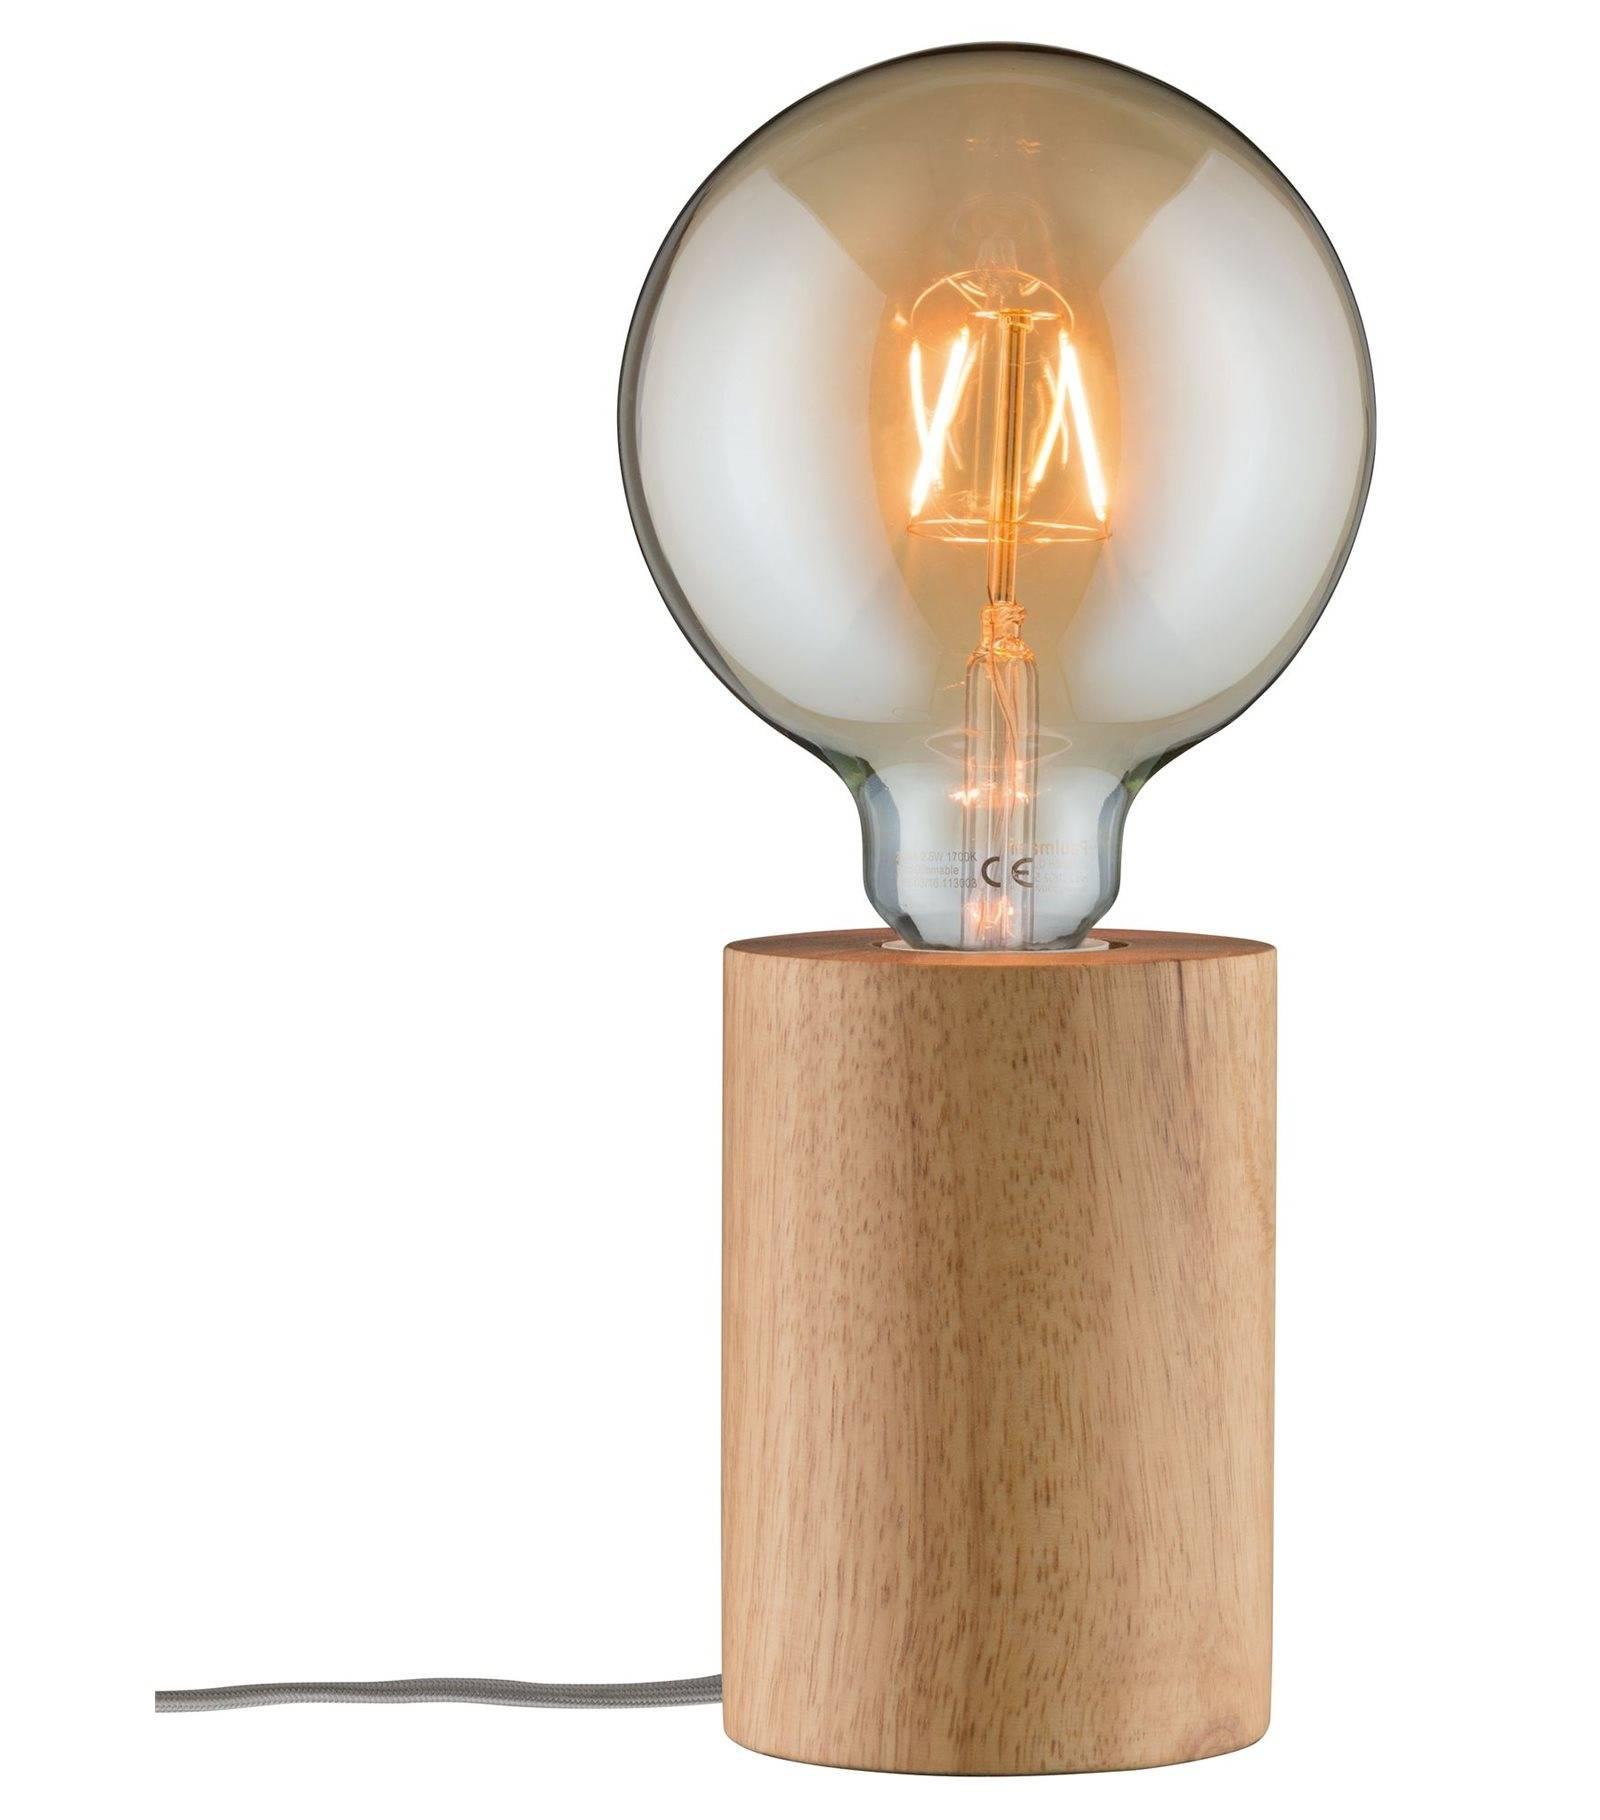 PAULMANN Lampe de table TALIN max 1x20W PAULMANN - 79640